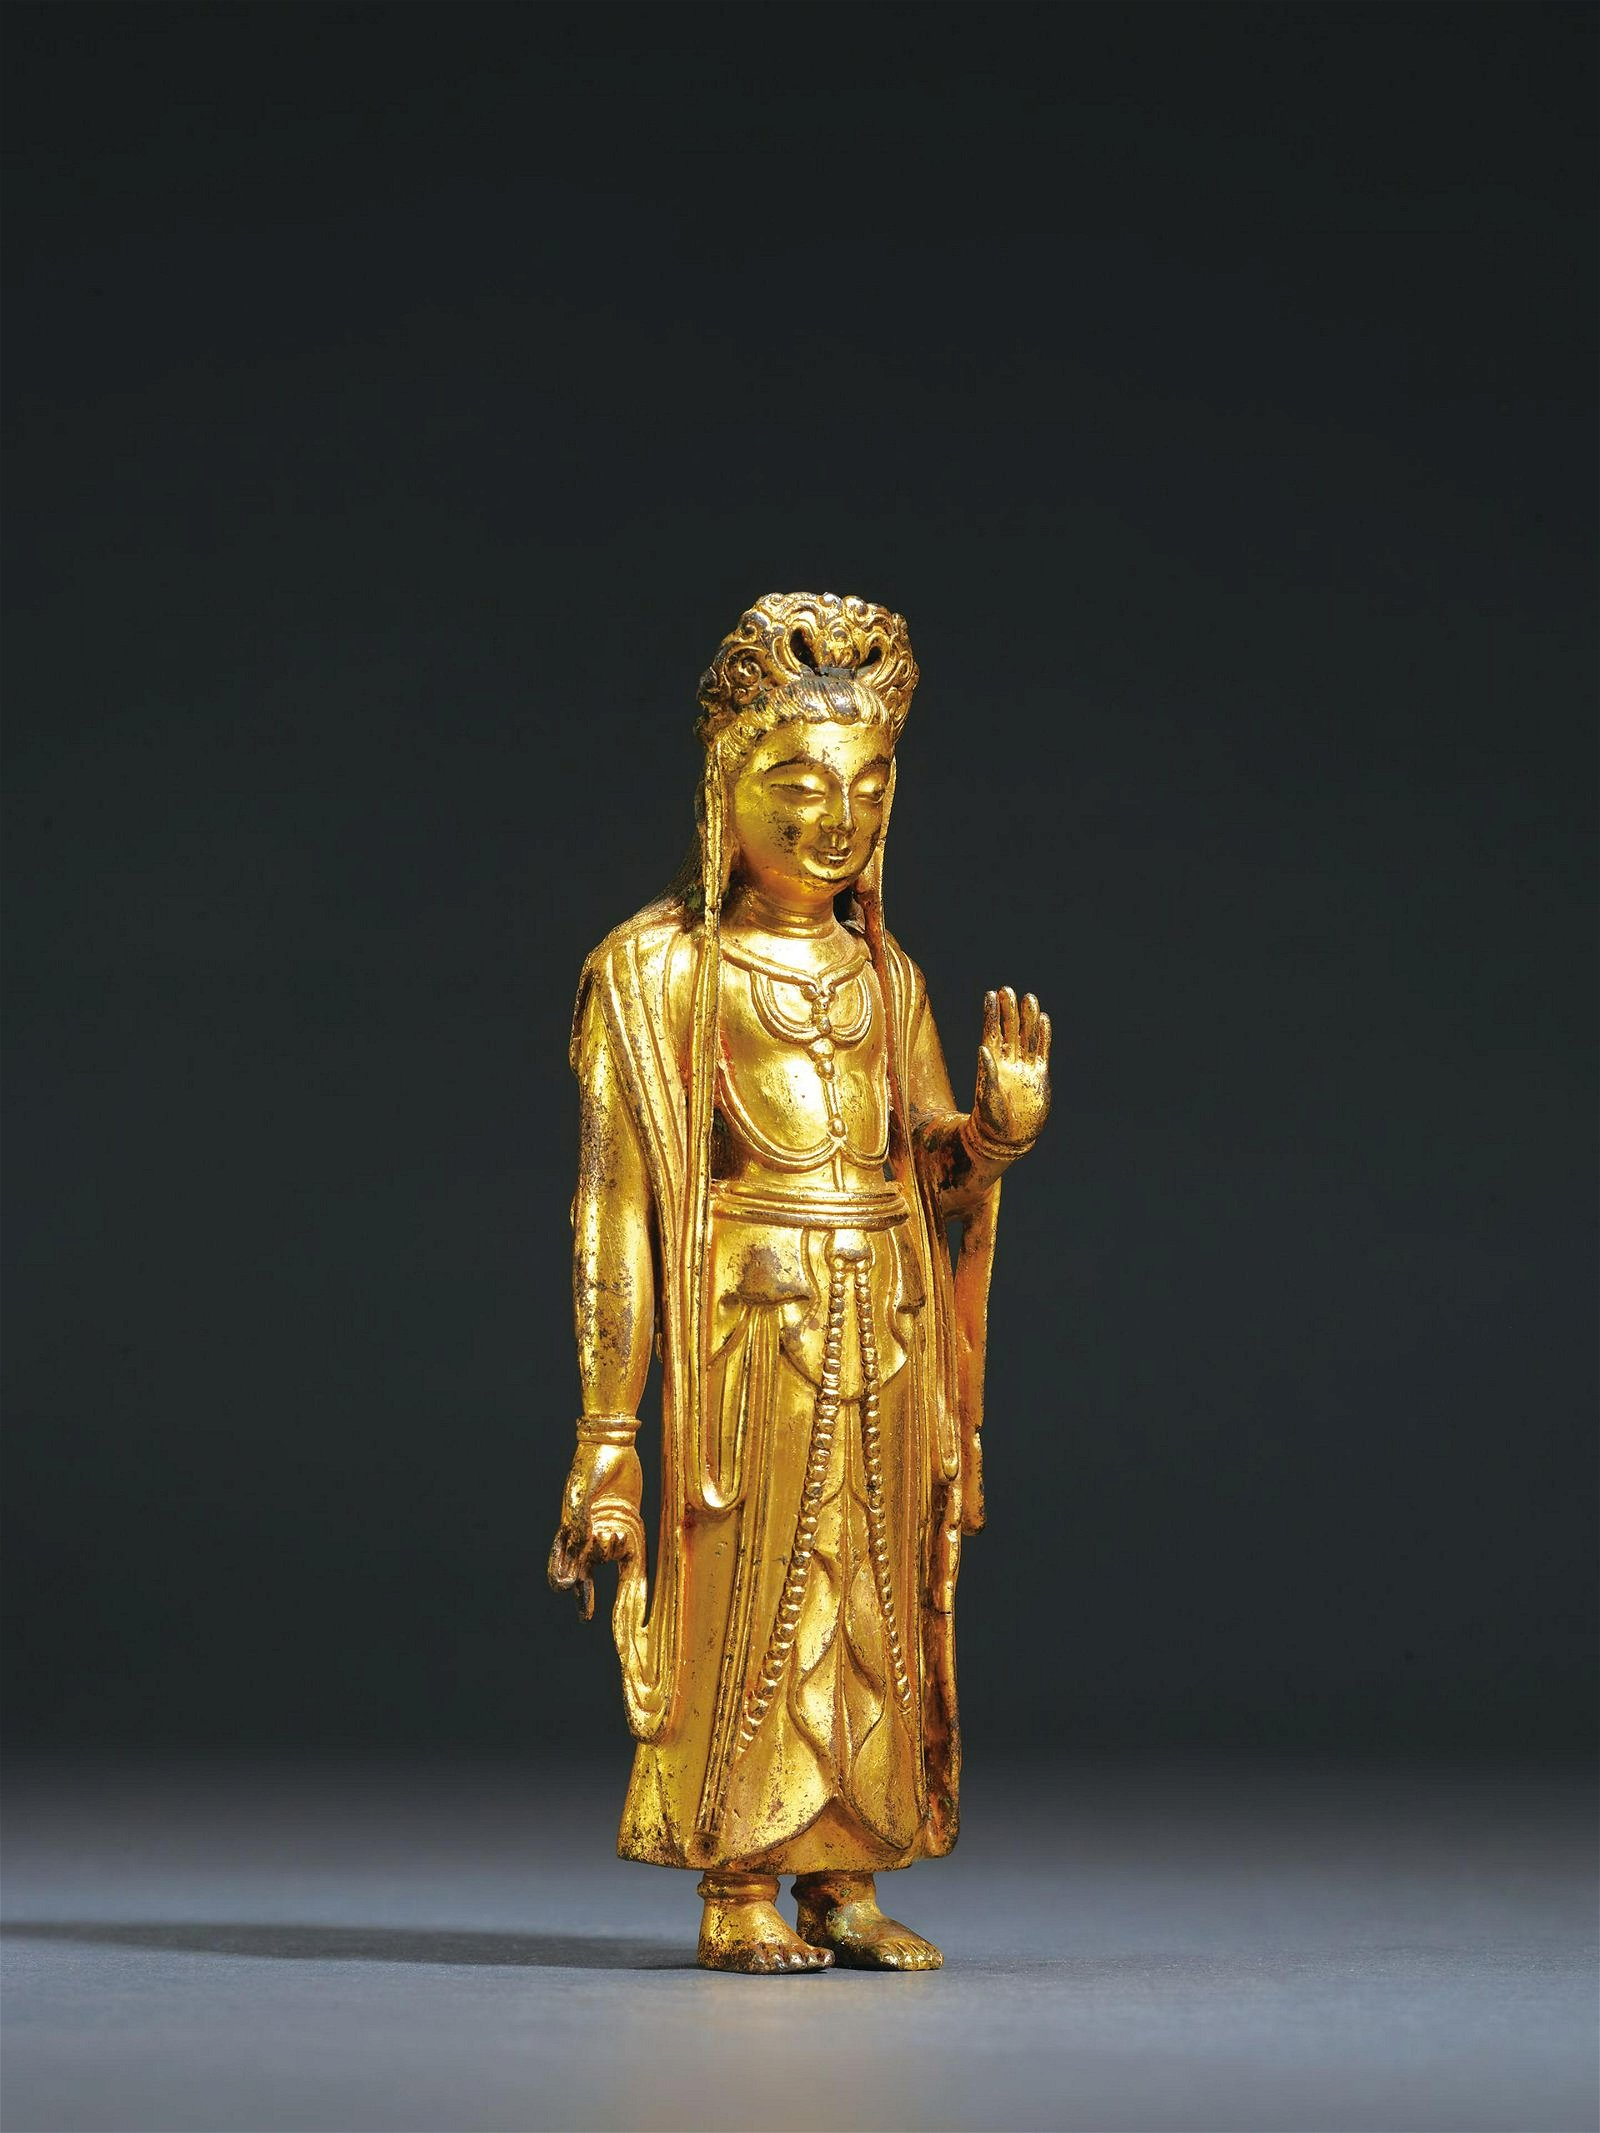 A GILT-BRONZE FIGURE OF STANDING BUDHISATTVA